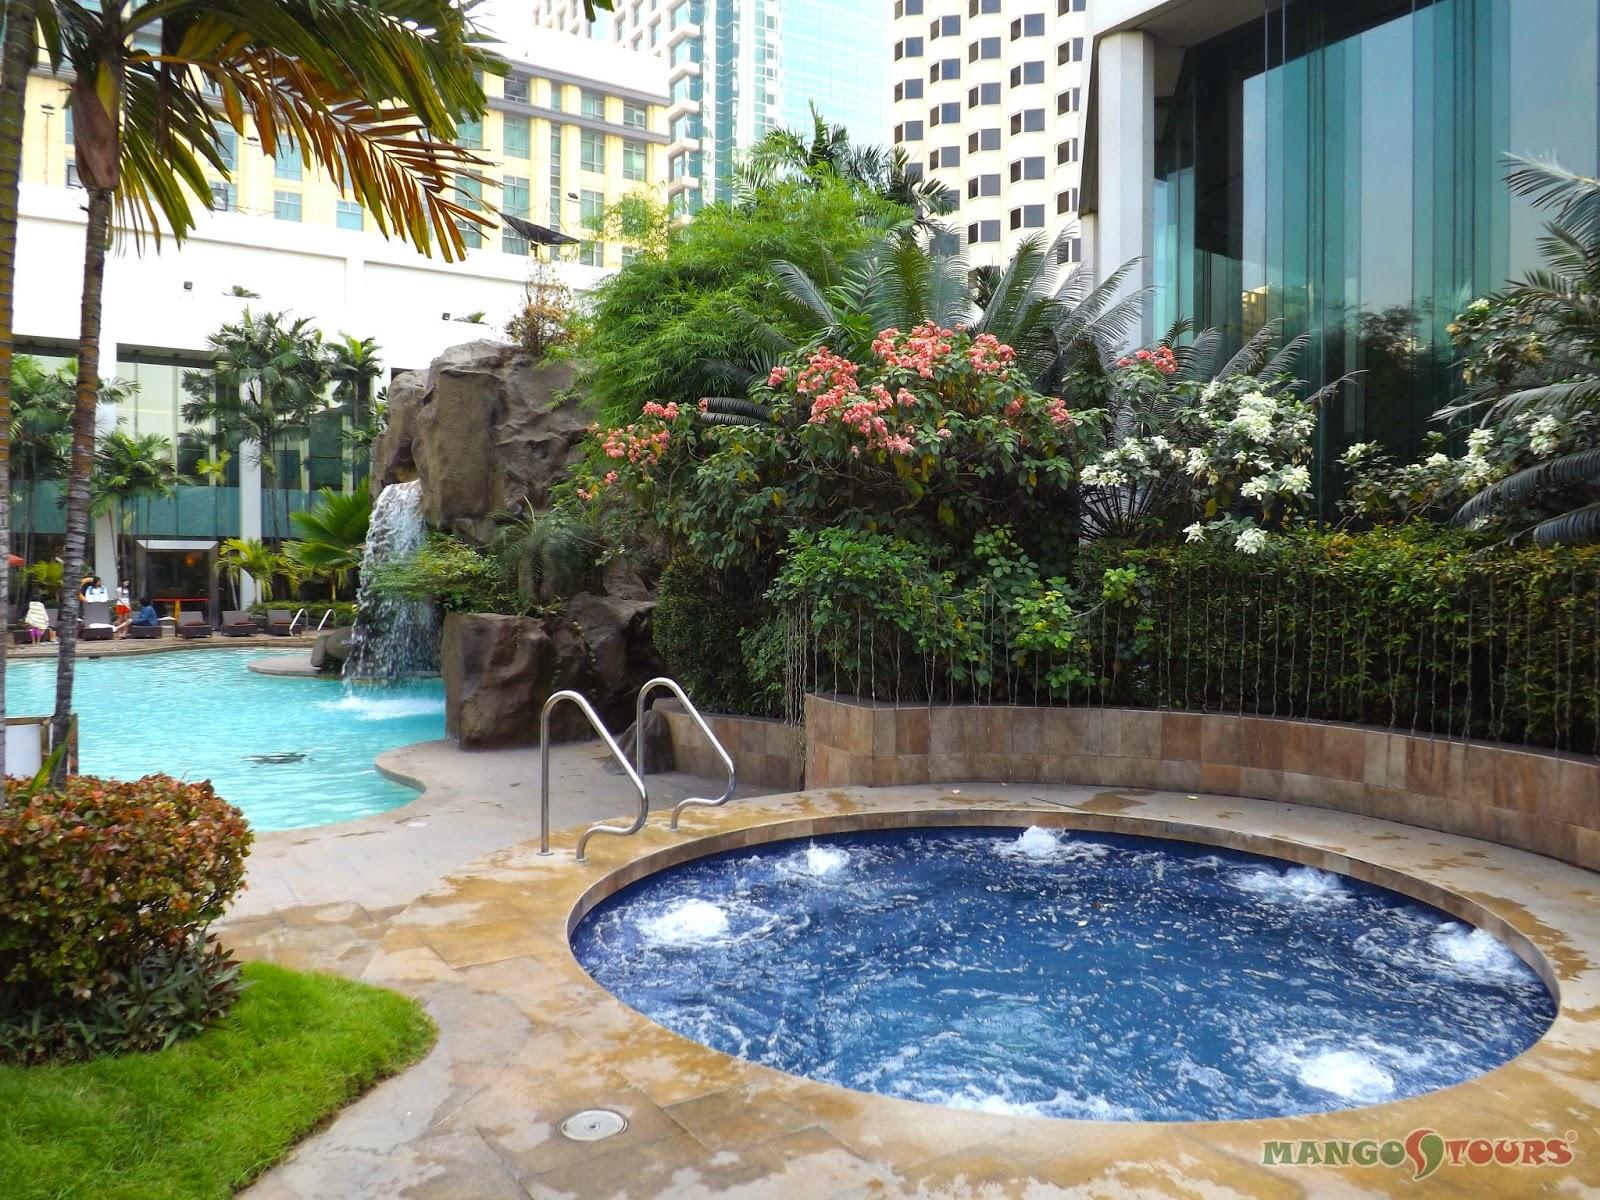 Diamond Hotel Philippines Elegance At Its Finest